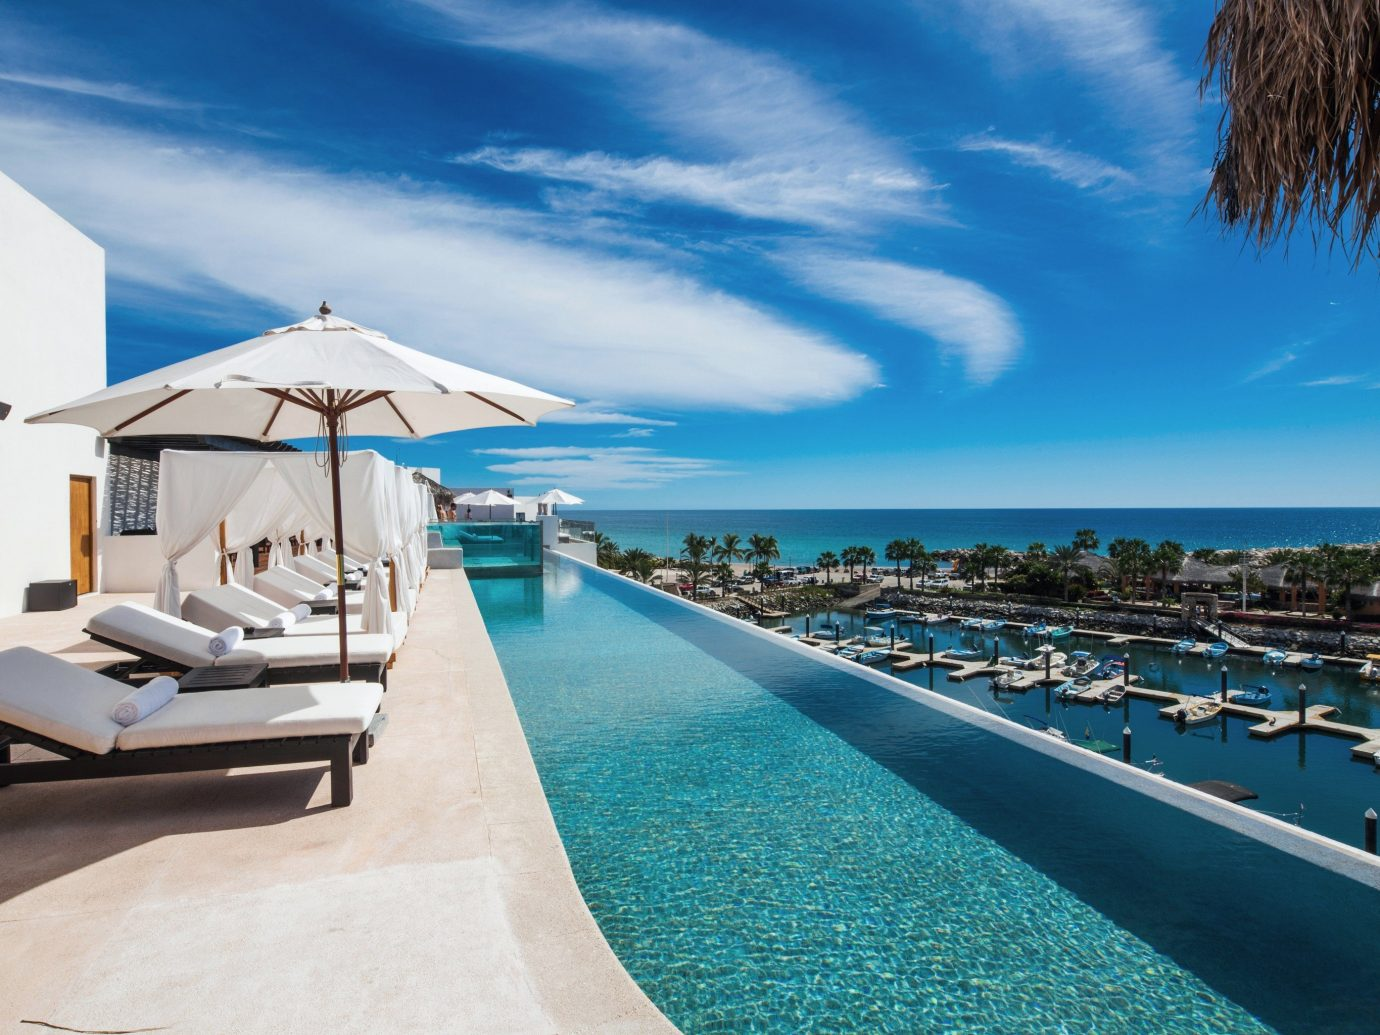 Hotels sky outdoor water chair Beach Sea vacation Ocean caribbean swimming pool Resort marina estate Coast bay dock Lagoon blue lined shore sandy